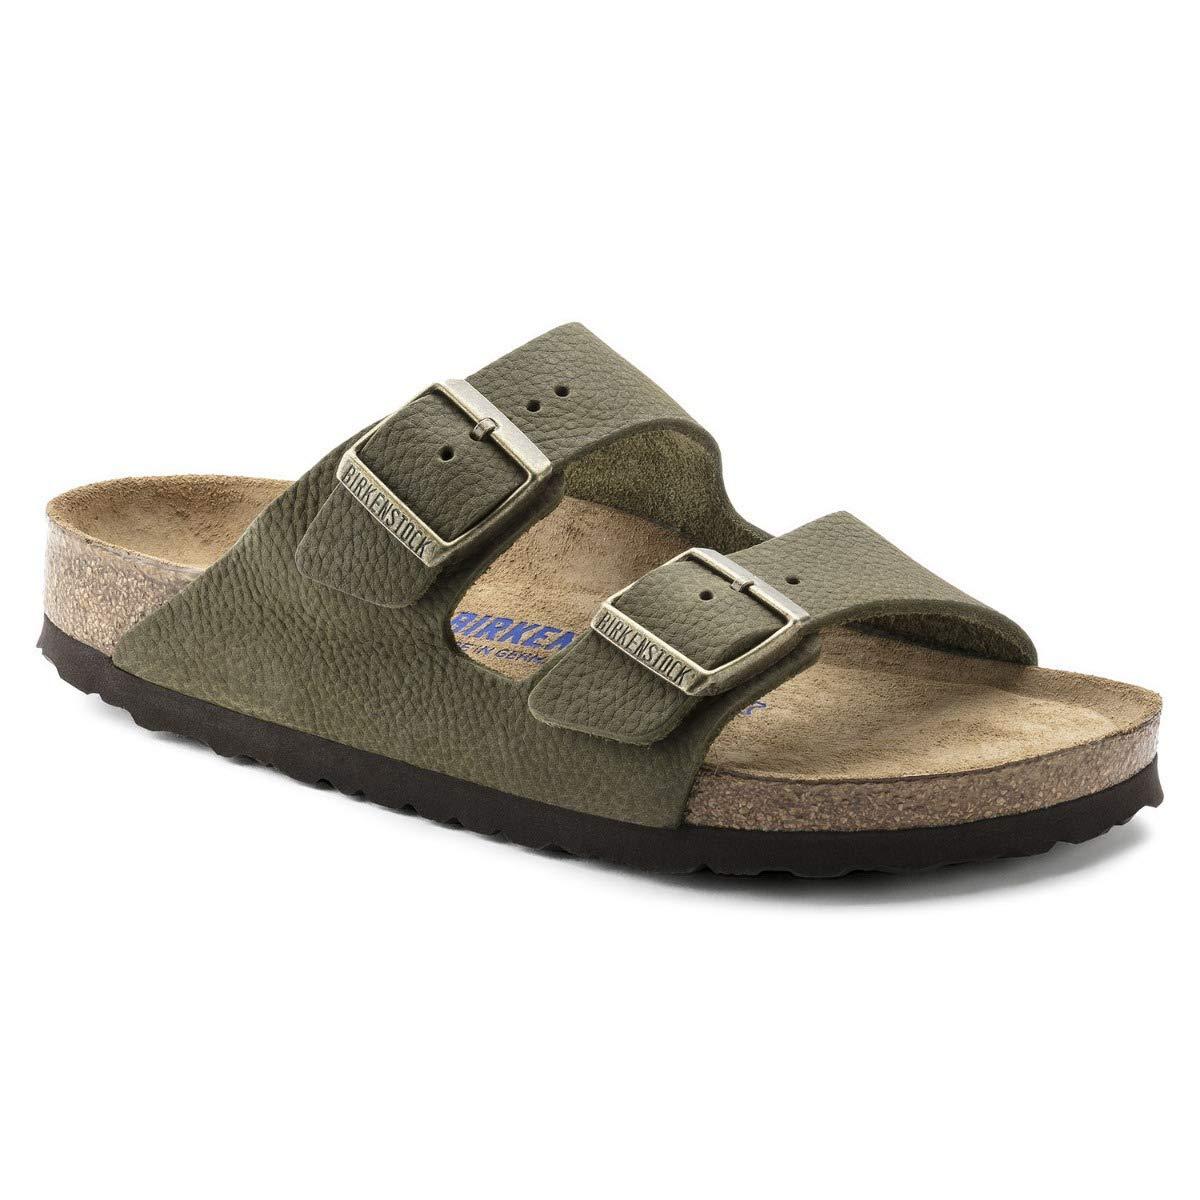 sports shoes 1f4d2 905be Birkenstock Arizona Nubukleder Soft-Fußbett Steer Khaki Größe 41 Schmal